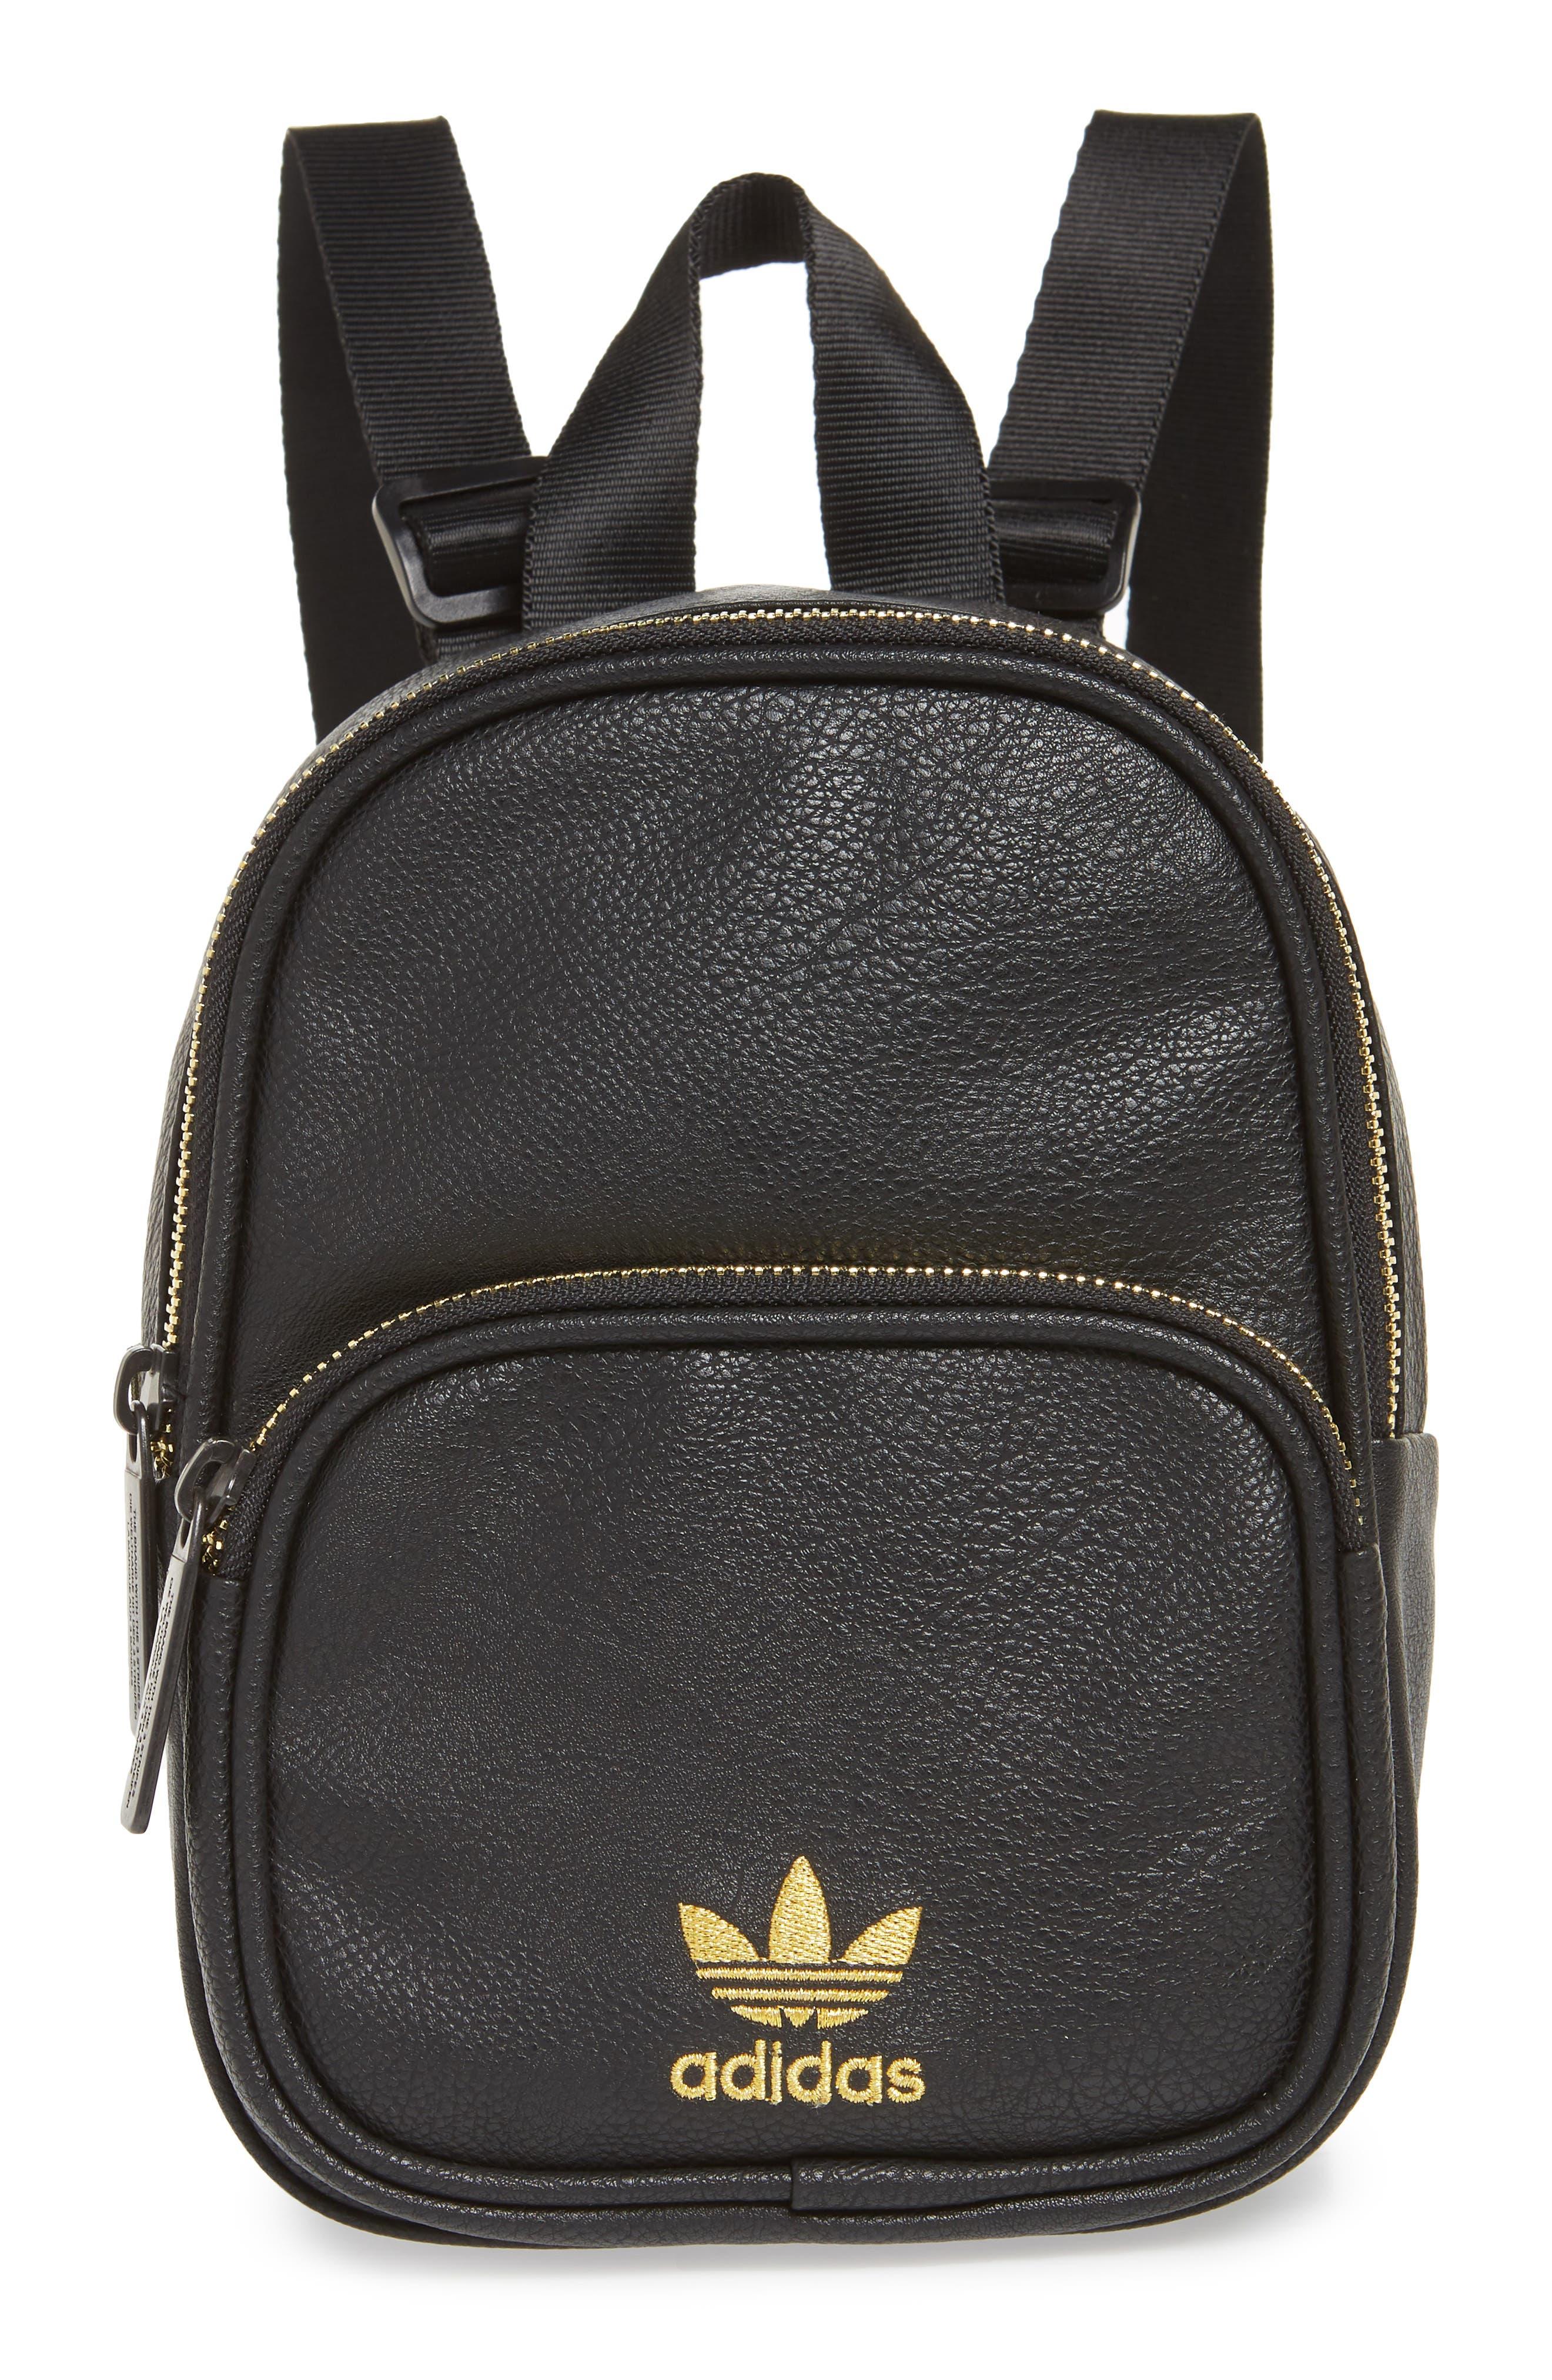 Adidas Originals Mini Faux Leather Backpack - Black